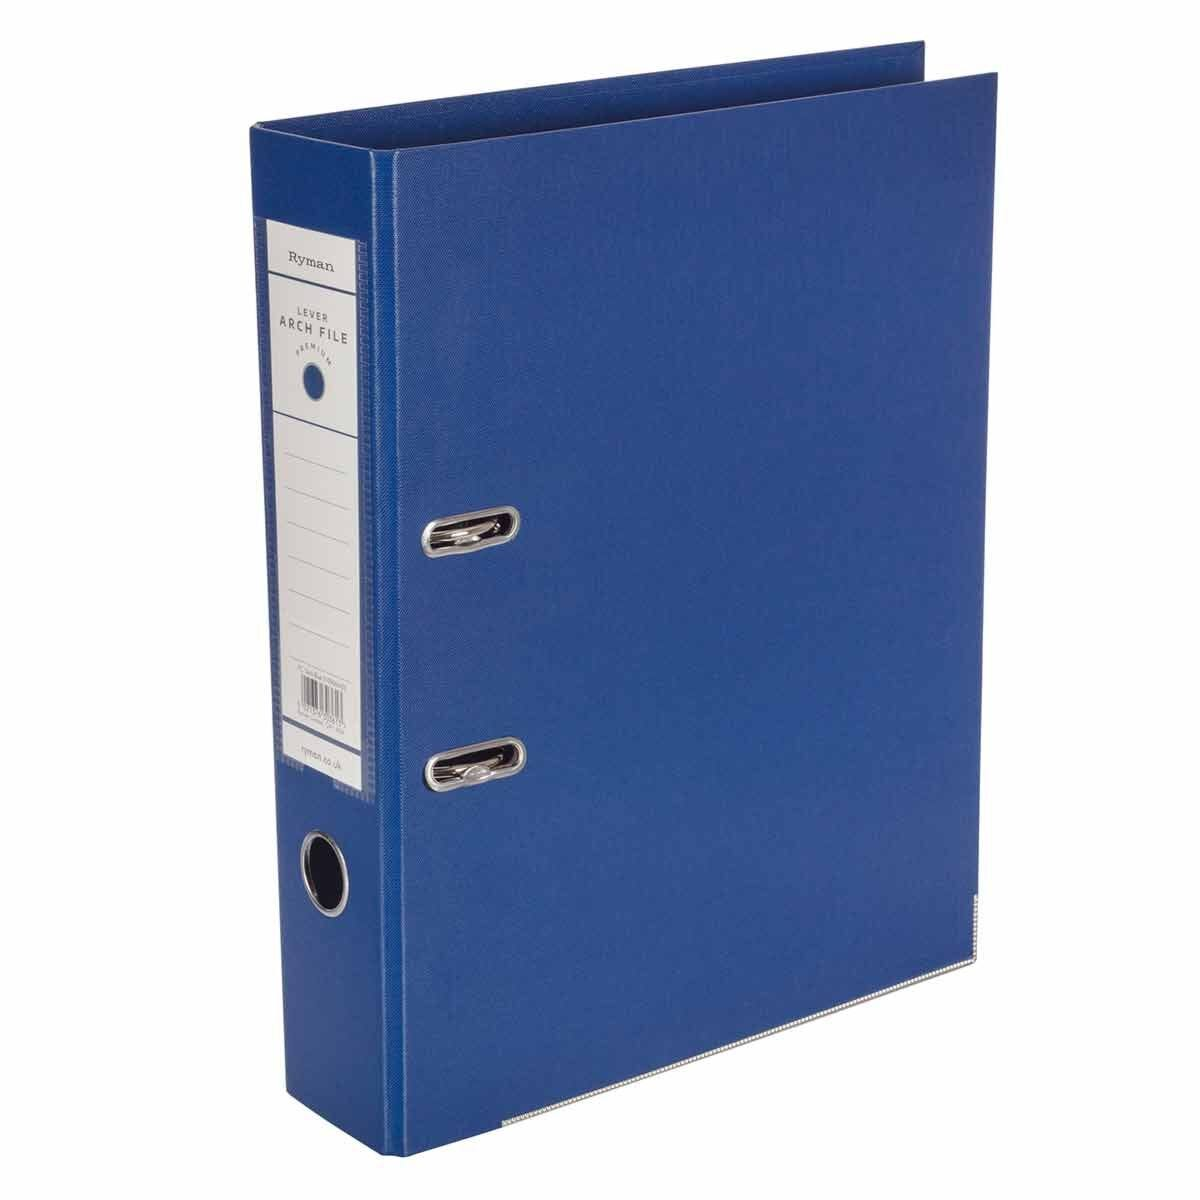 Ryman Premium Lever Arch File Foolscap Dark Blue